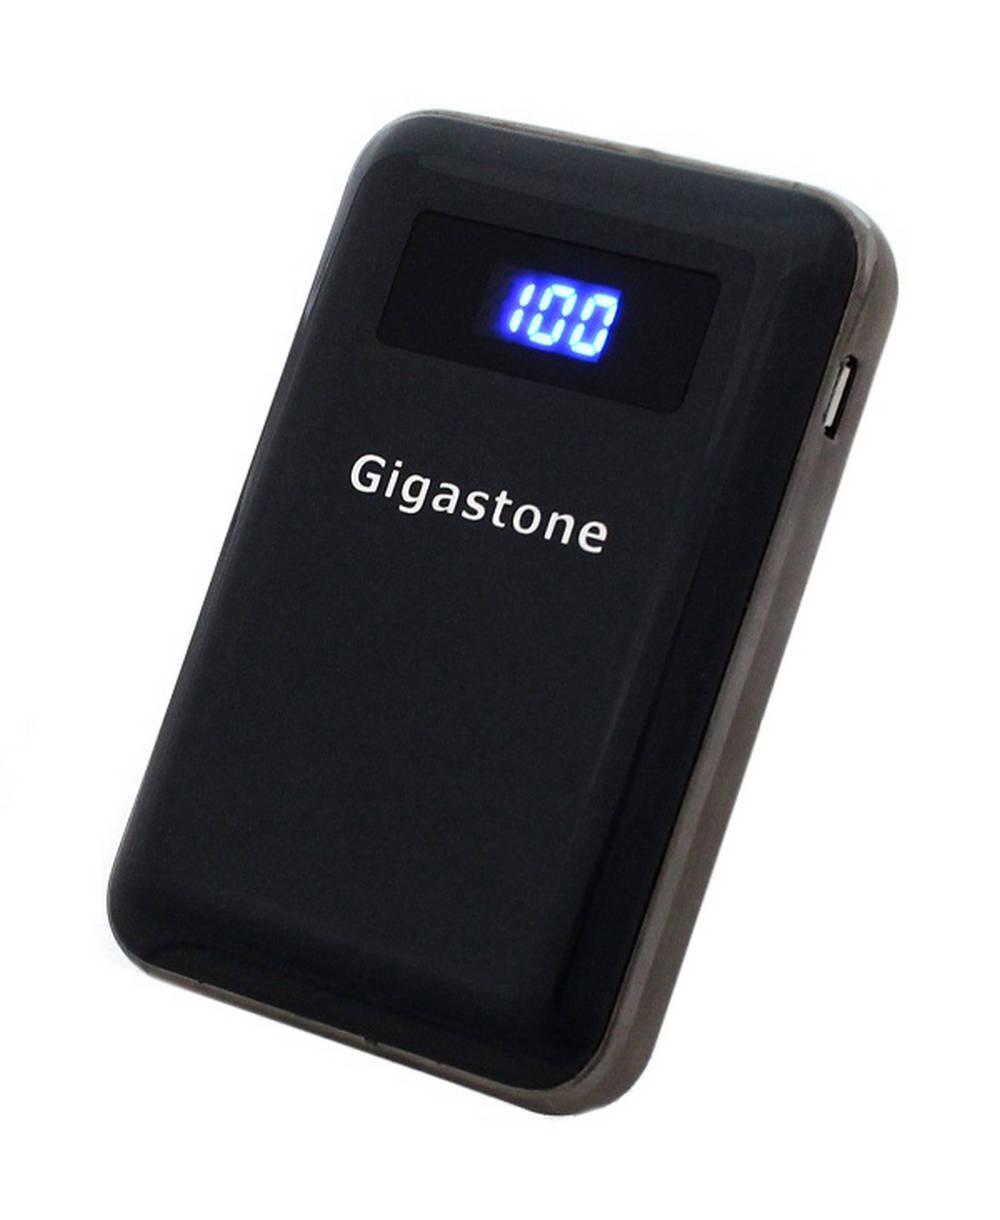 Power Bank Gigastone P2S-90S 9000 mAh Dual Μαύρο με Ένδειξη Επιπέδου Φόρτισης Led